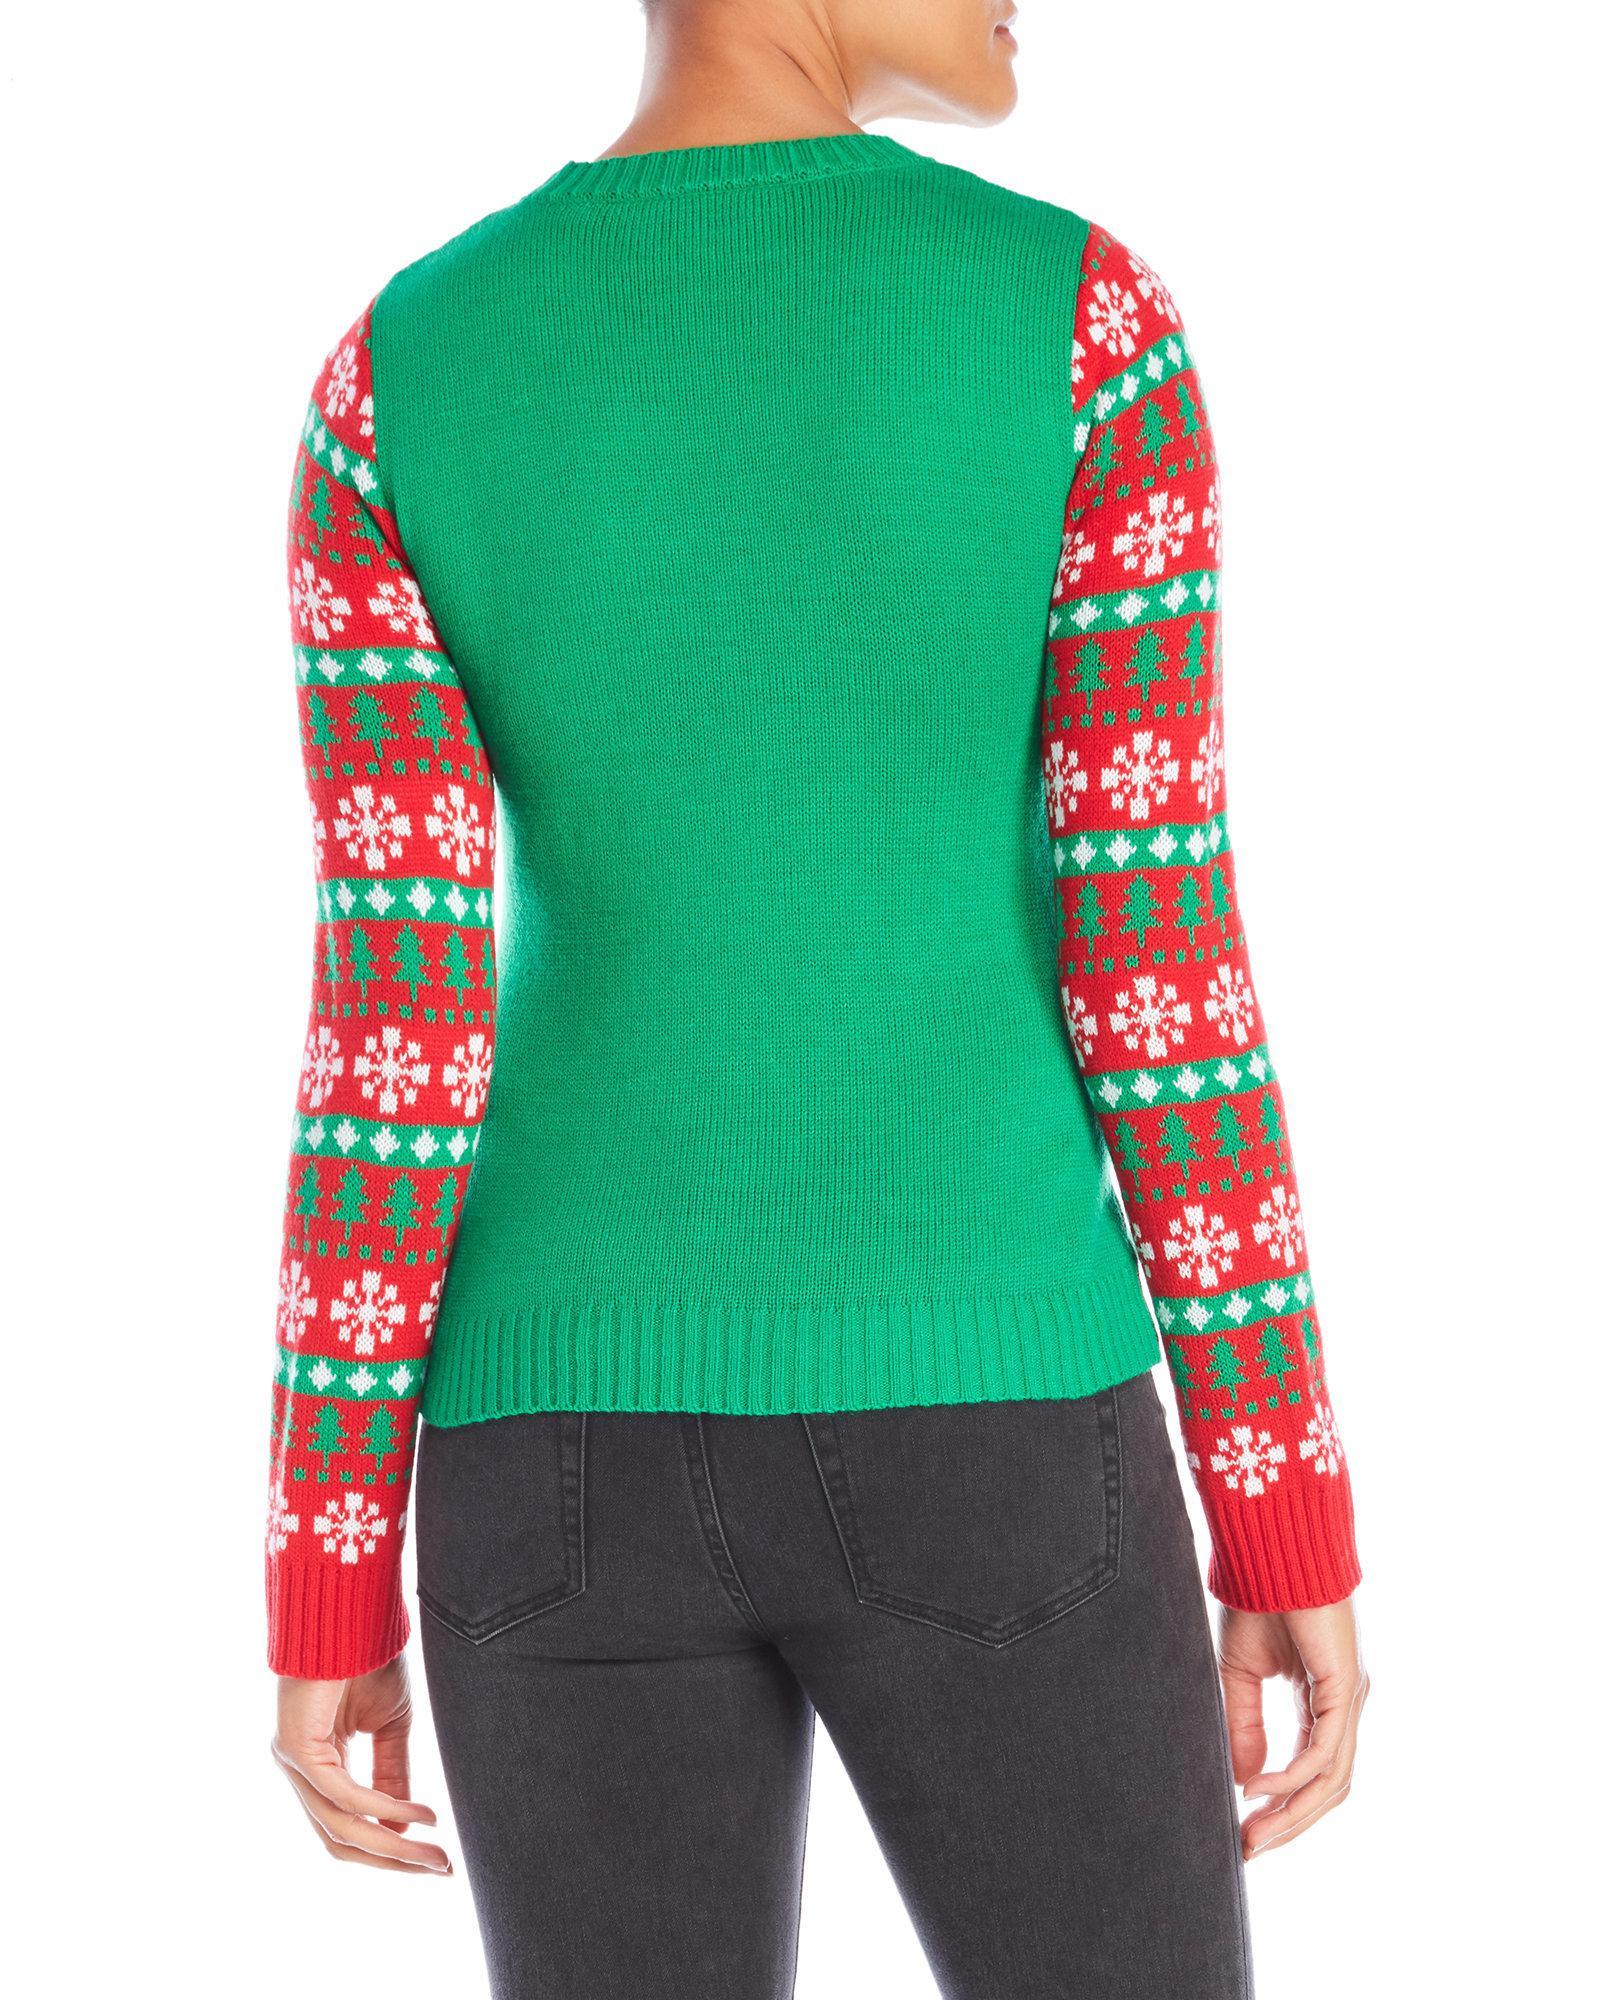 Lyst - Derek Heart Kitten Merry Christmas Sweater in Green